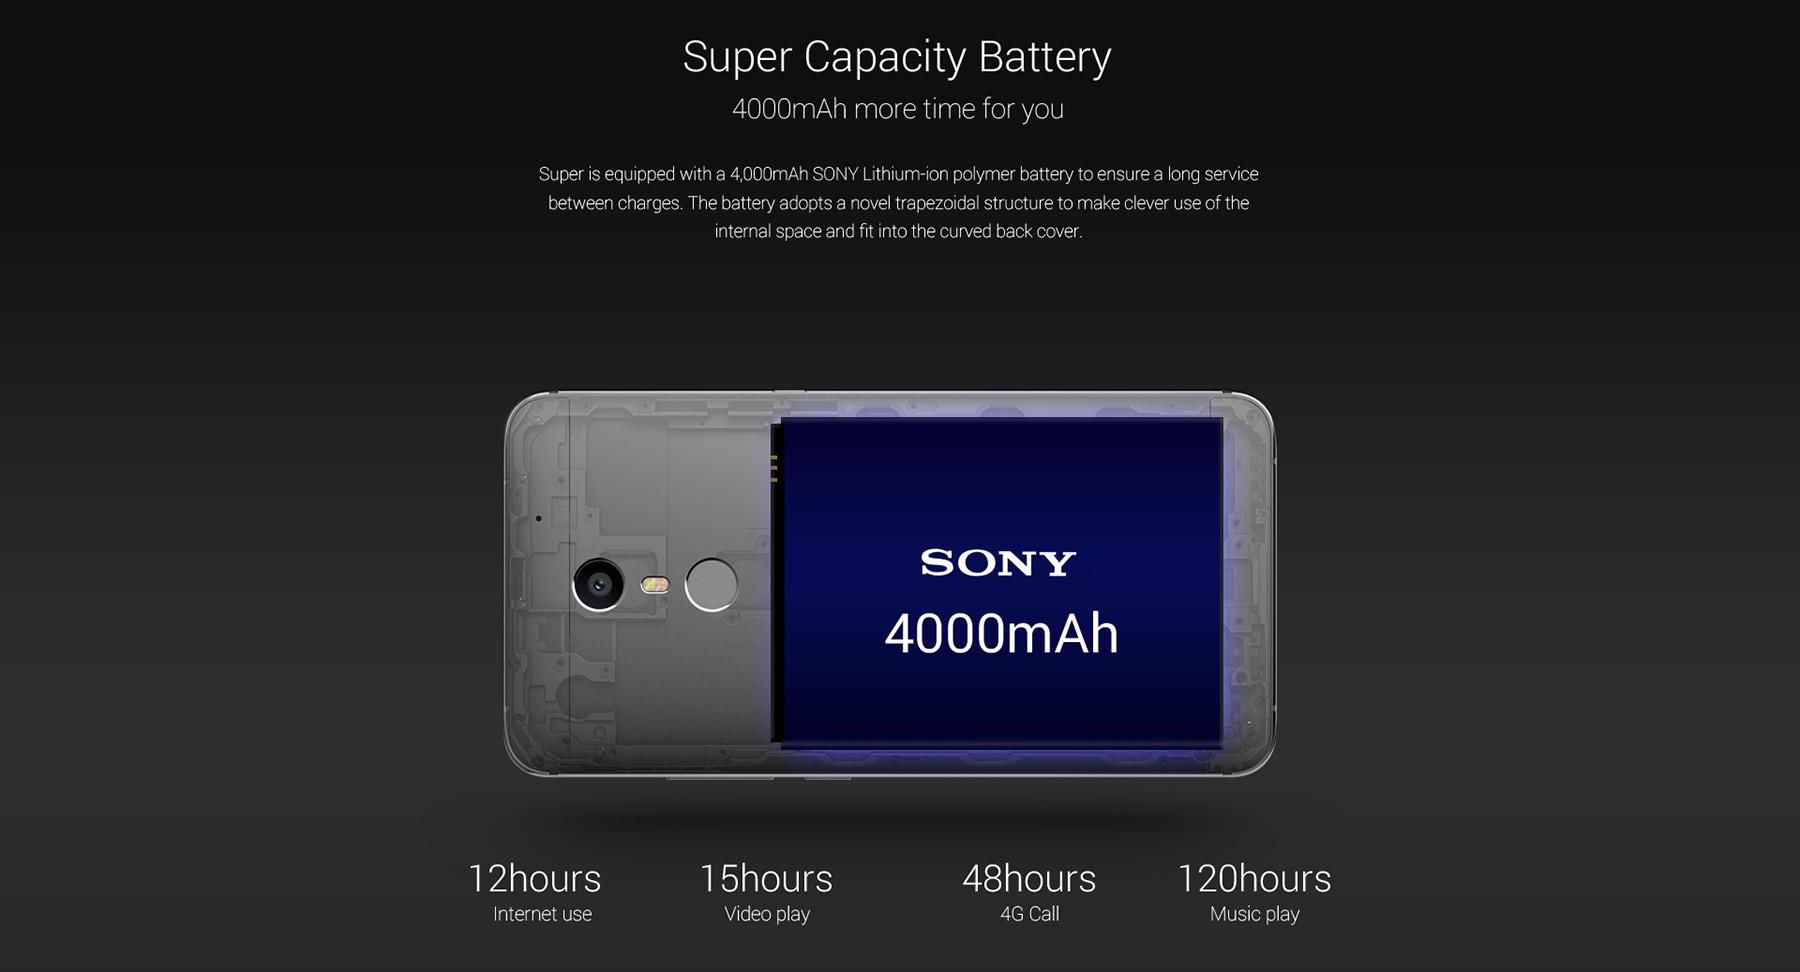 UMI Super , Sony Akku 4000 mah Laufzeit Tage, DHL Express China Deutschland Tage, Zoll PayPal China, Handy für Kinder